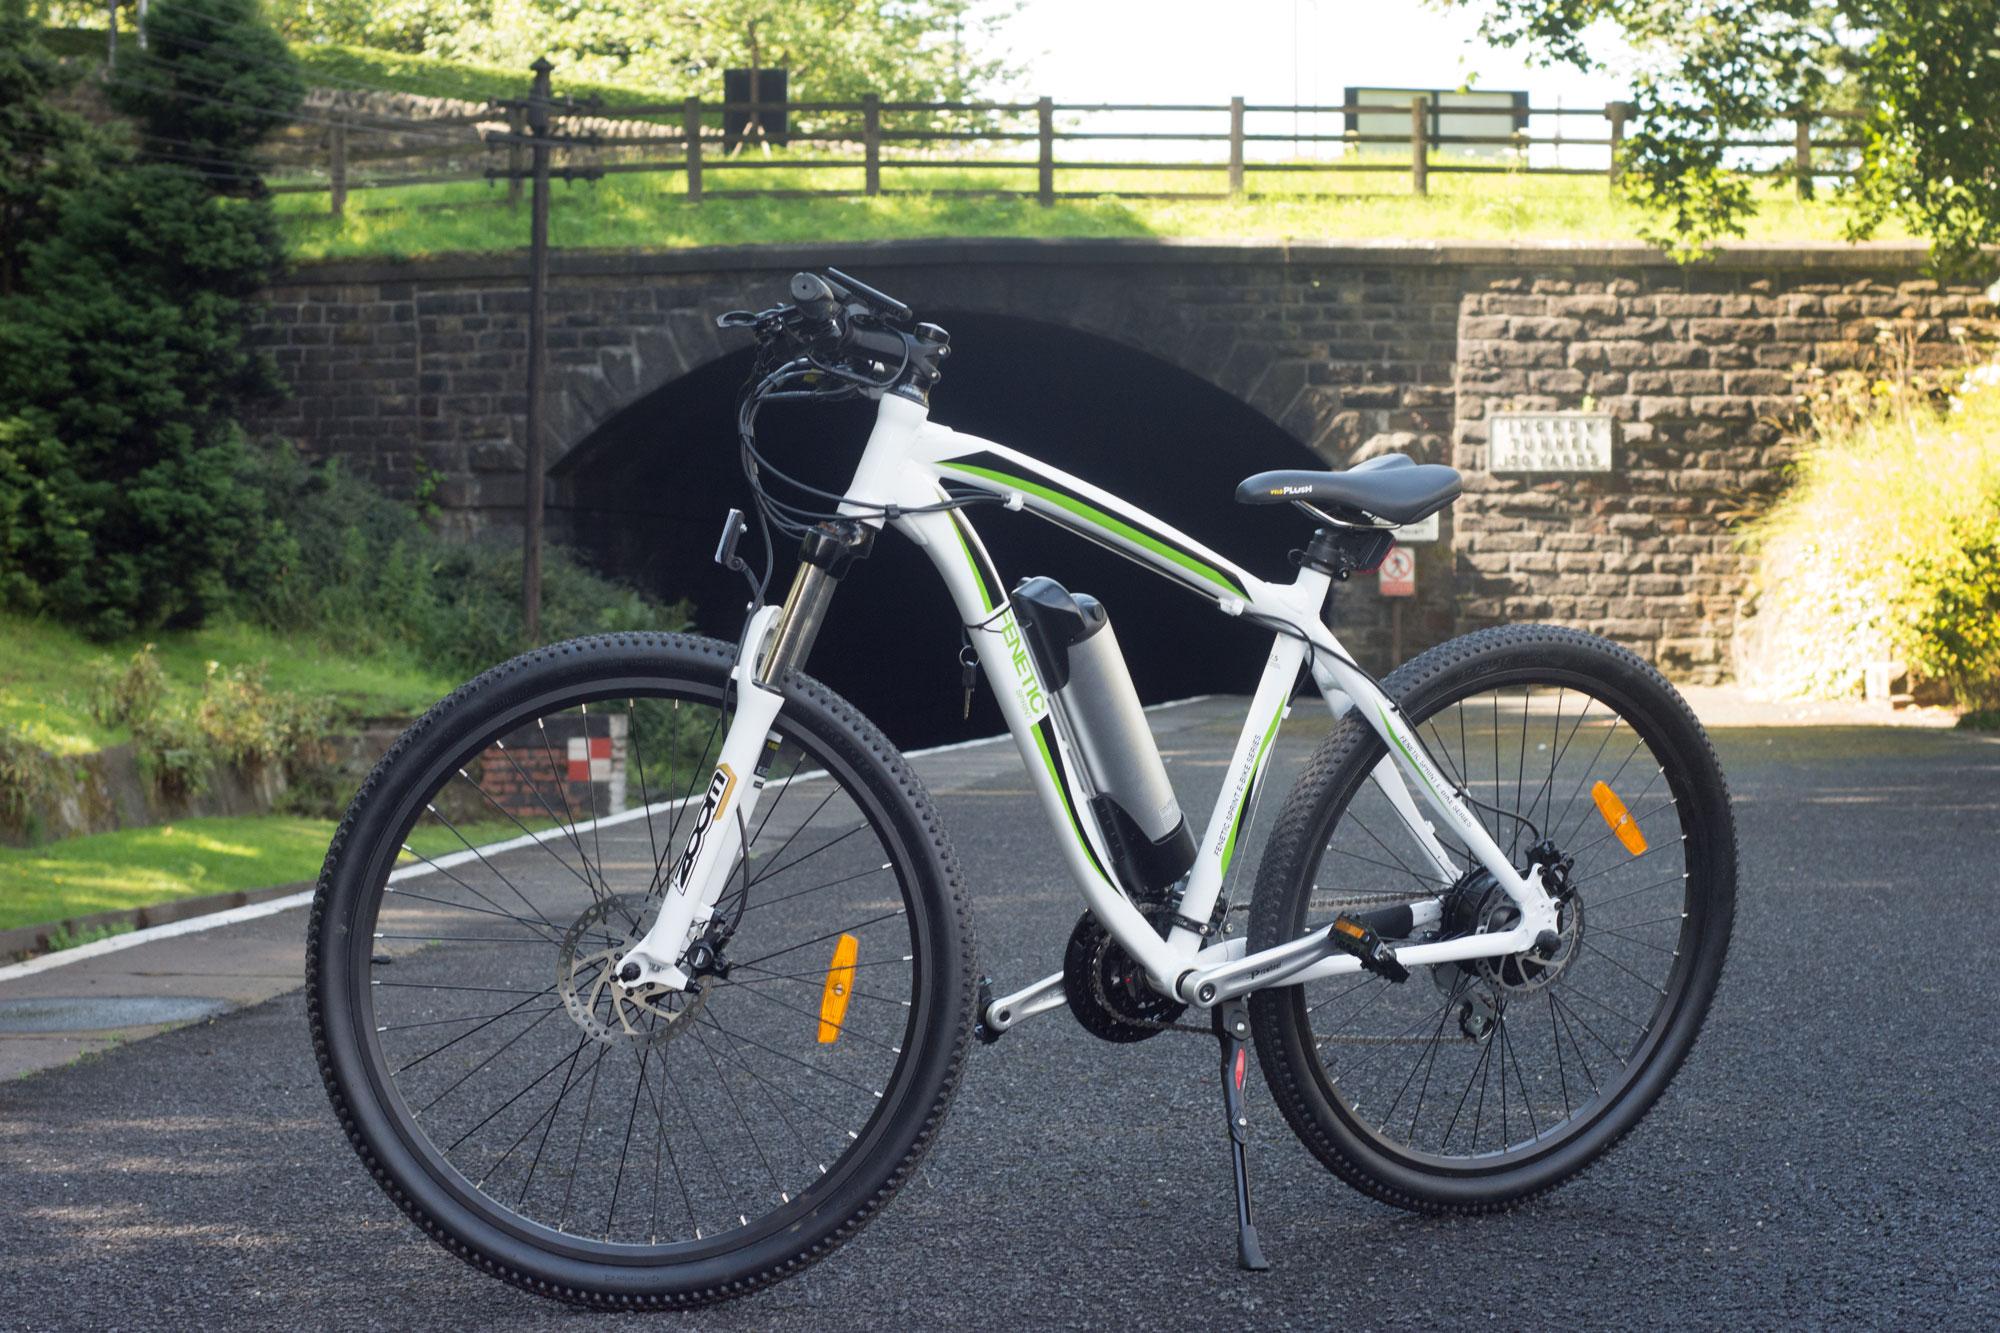 Fenetic Sprint electric mountain bike